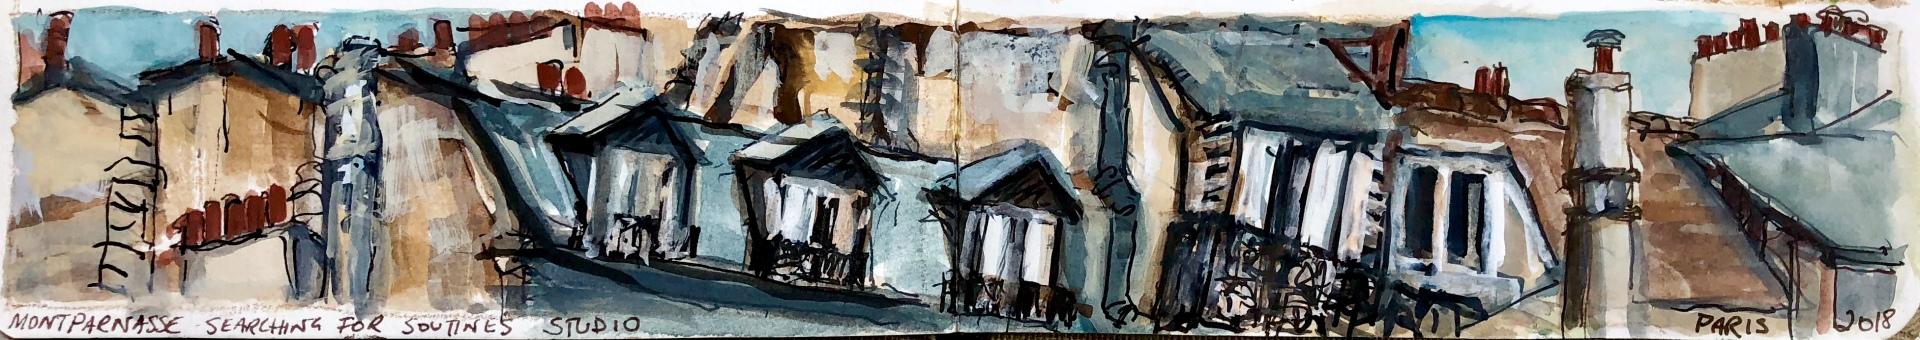 Searching for Soutine's Studio, Montparnasse